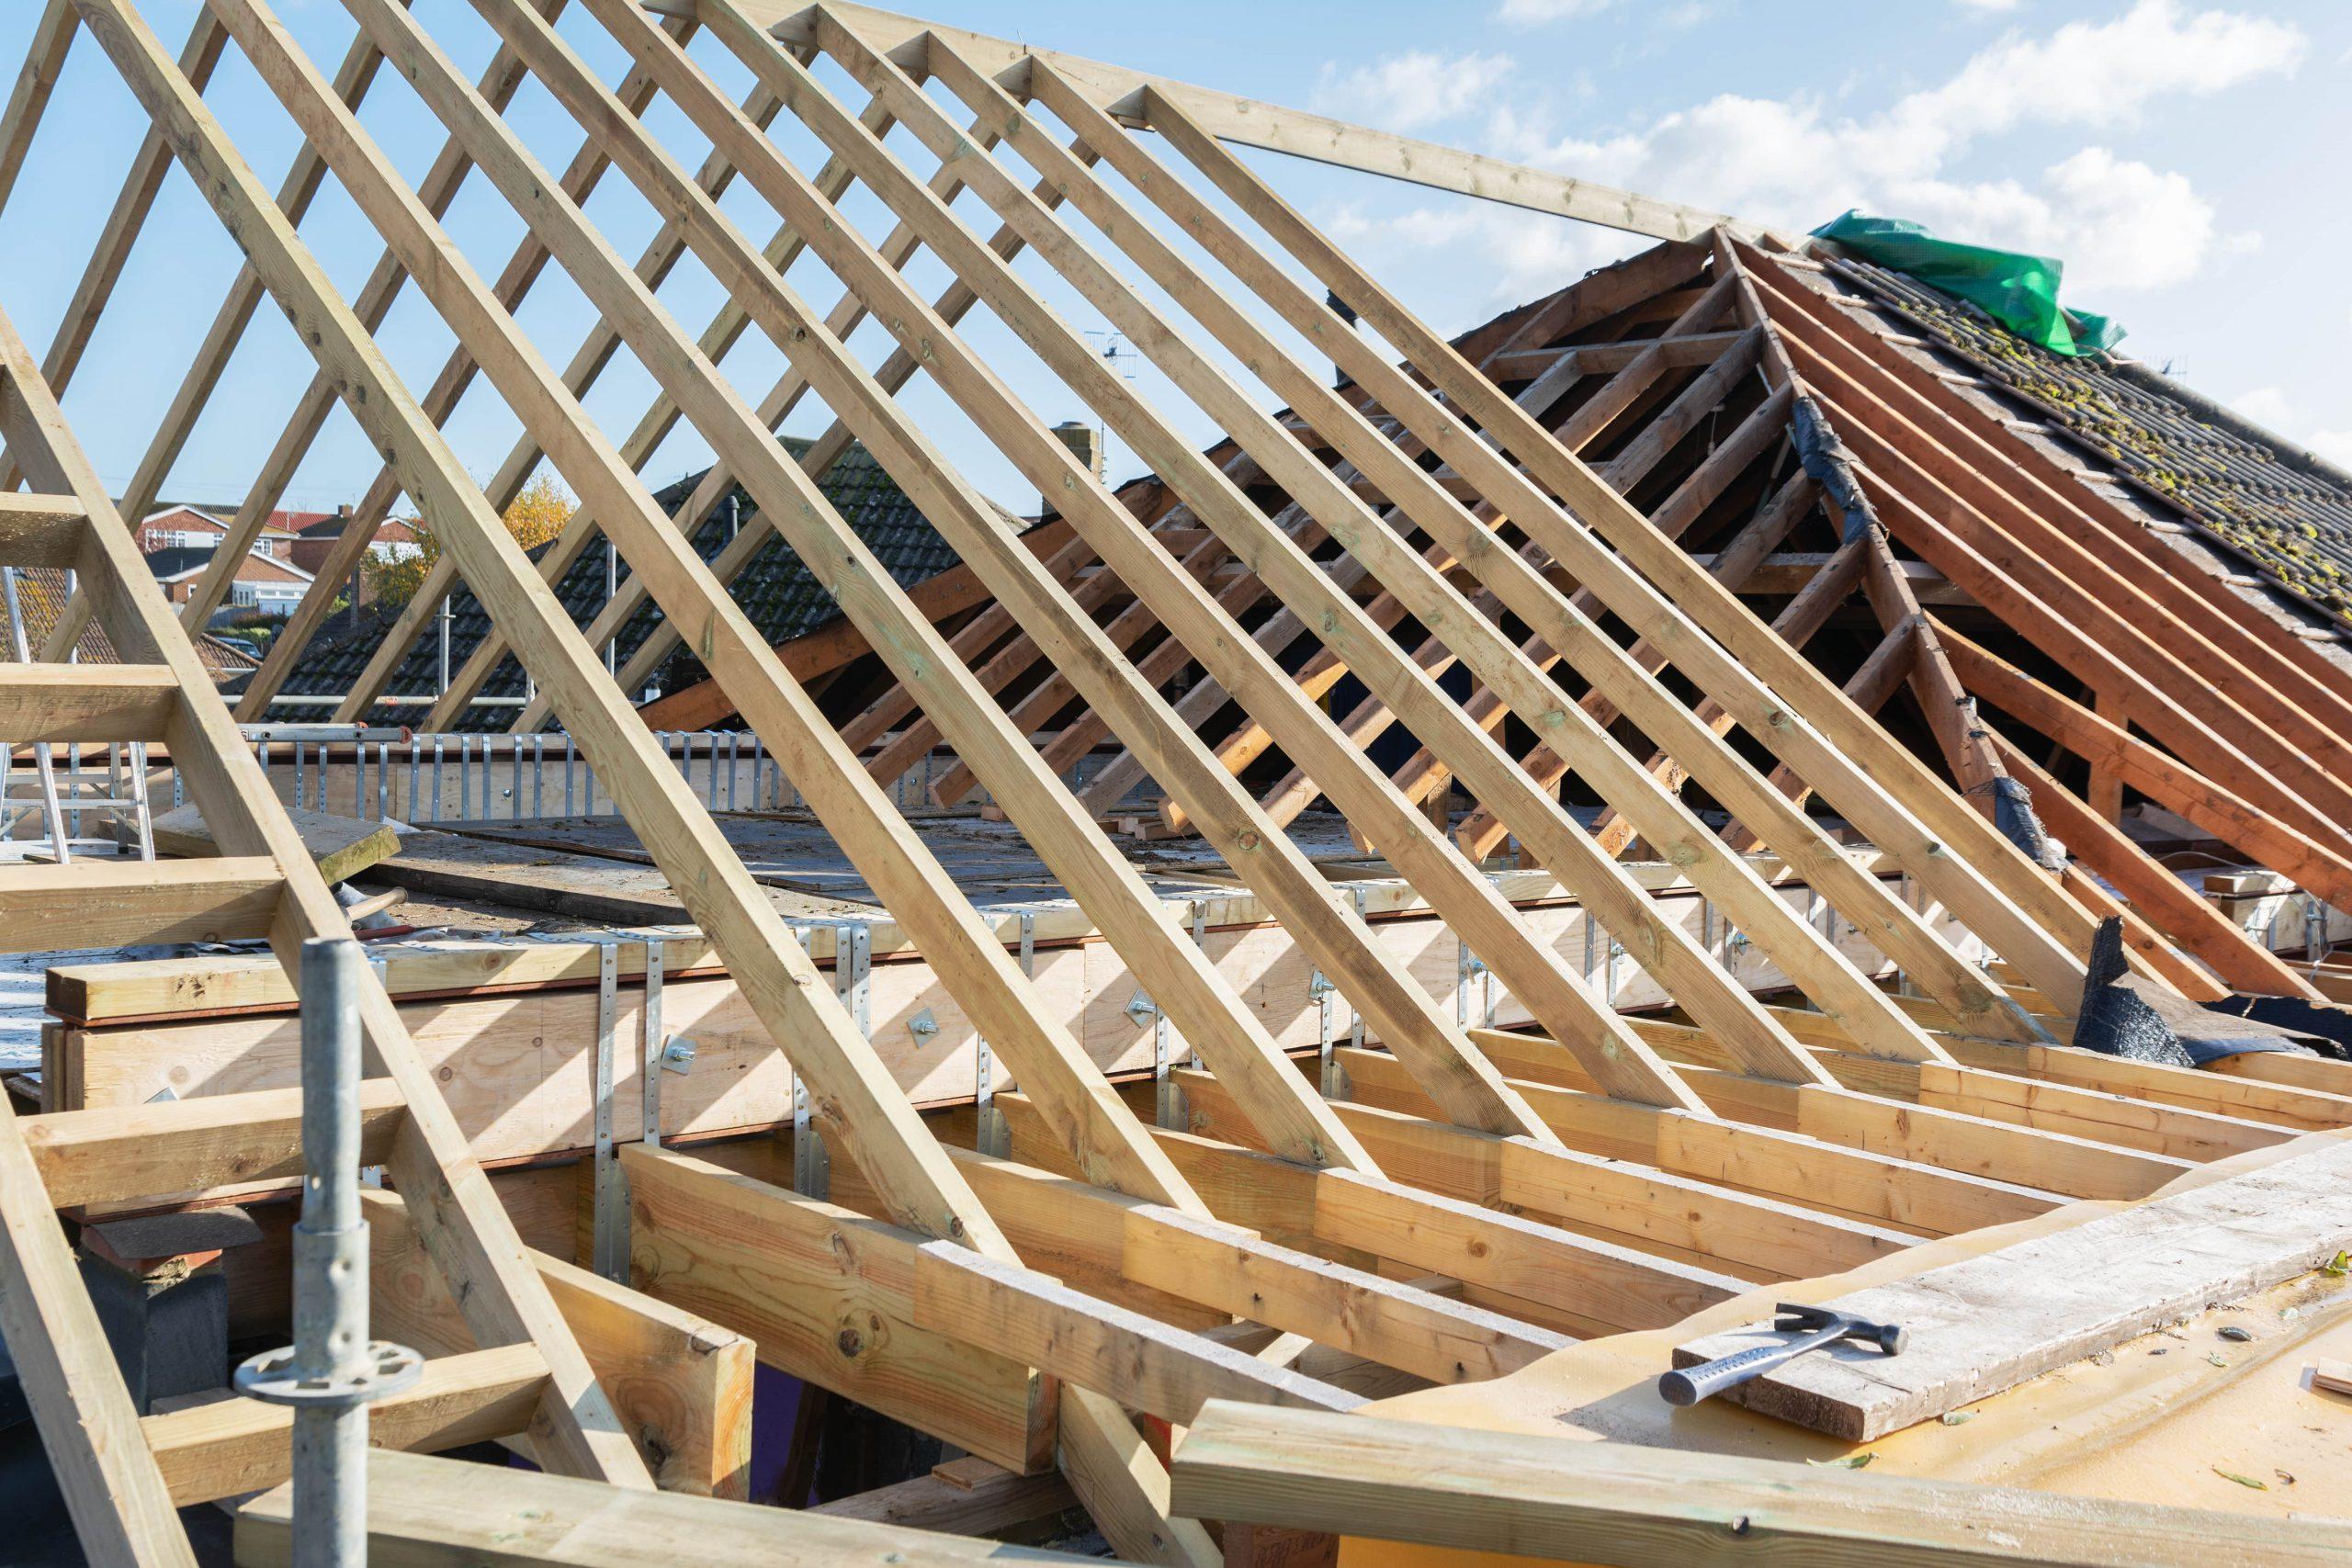 house-remodeling-London-renovation-company-London